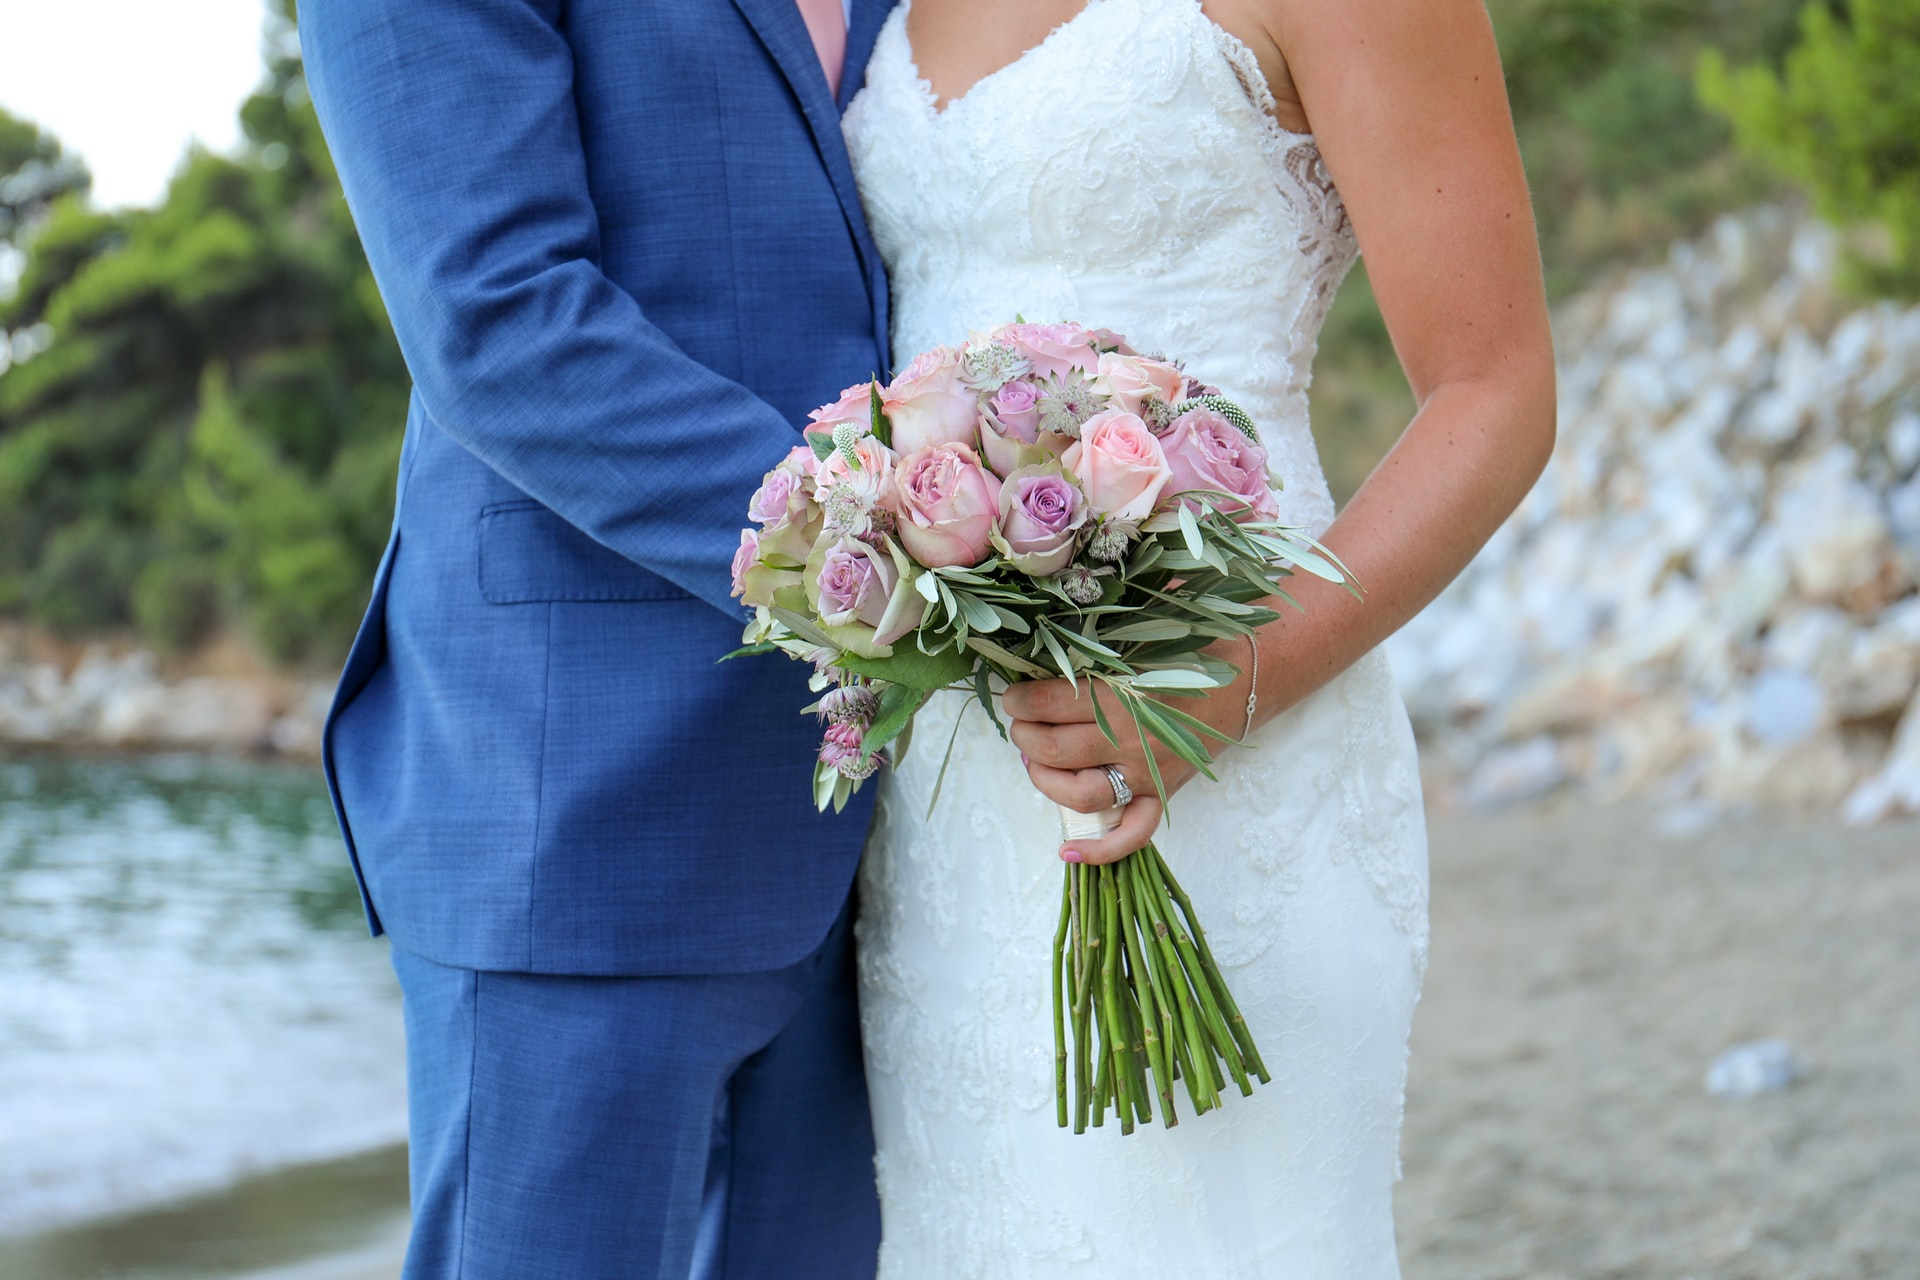 aegean-wedding-photography-wTUCs3dNHuY-unsplash